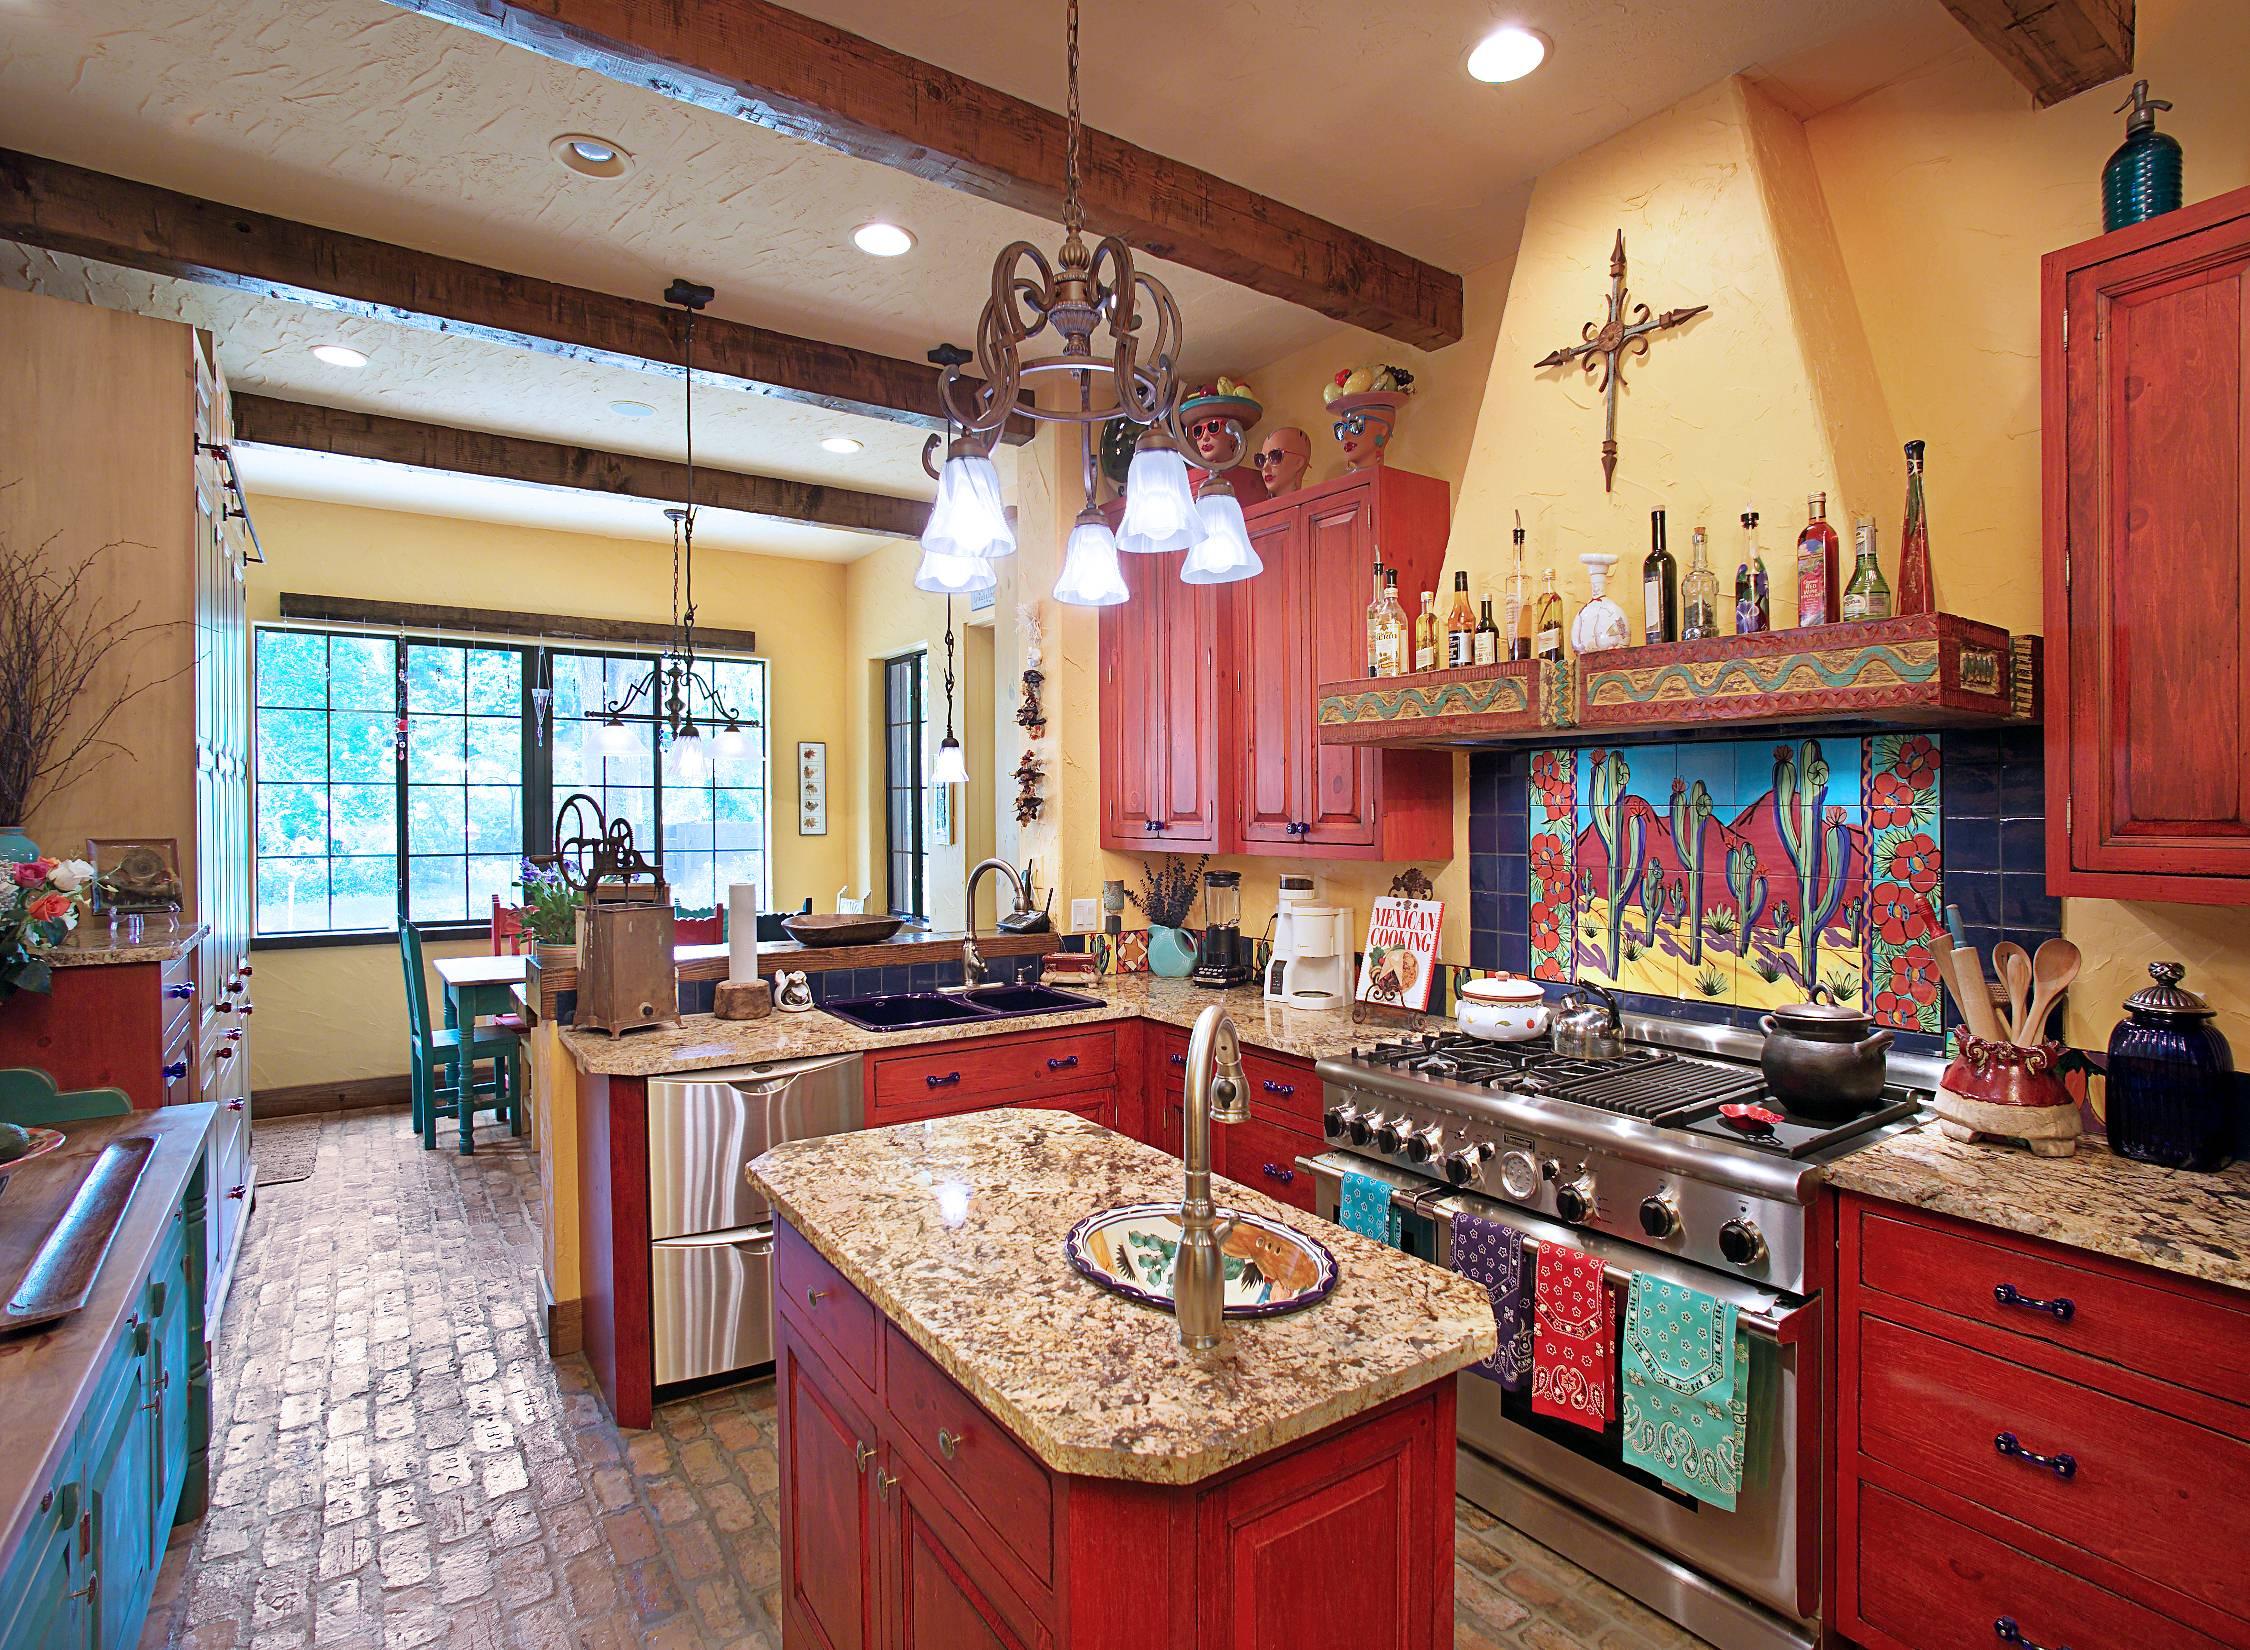 75 Beautiful Southwestern Kitchen Pictures Ideas April 2021 Houzz